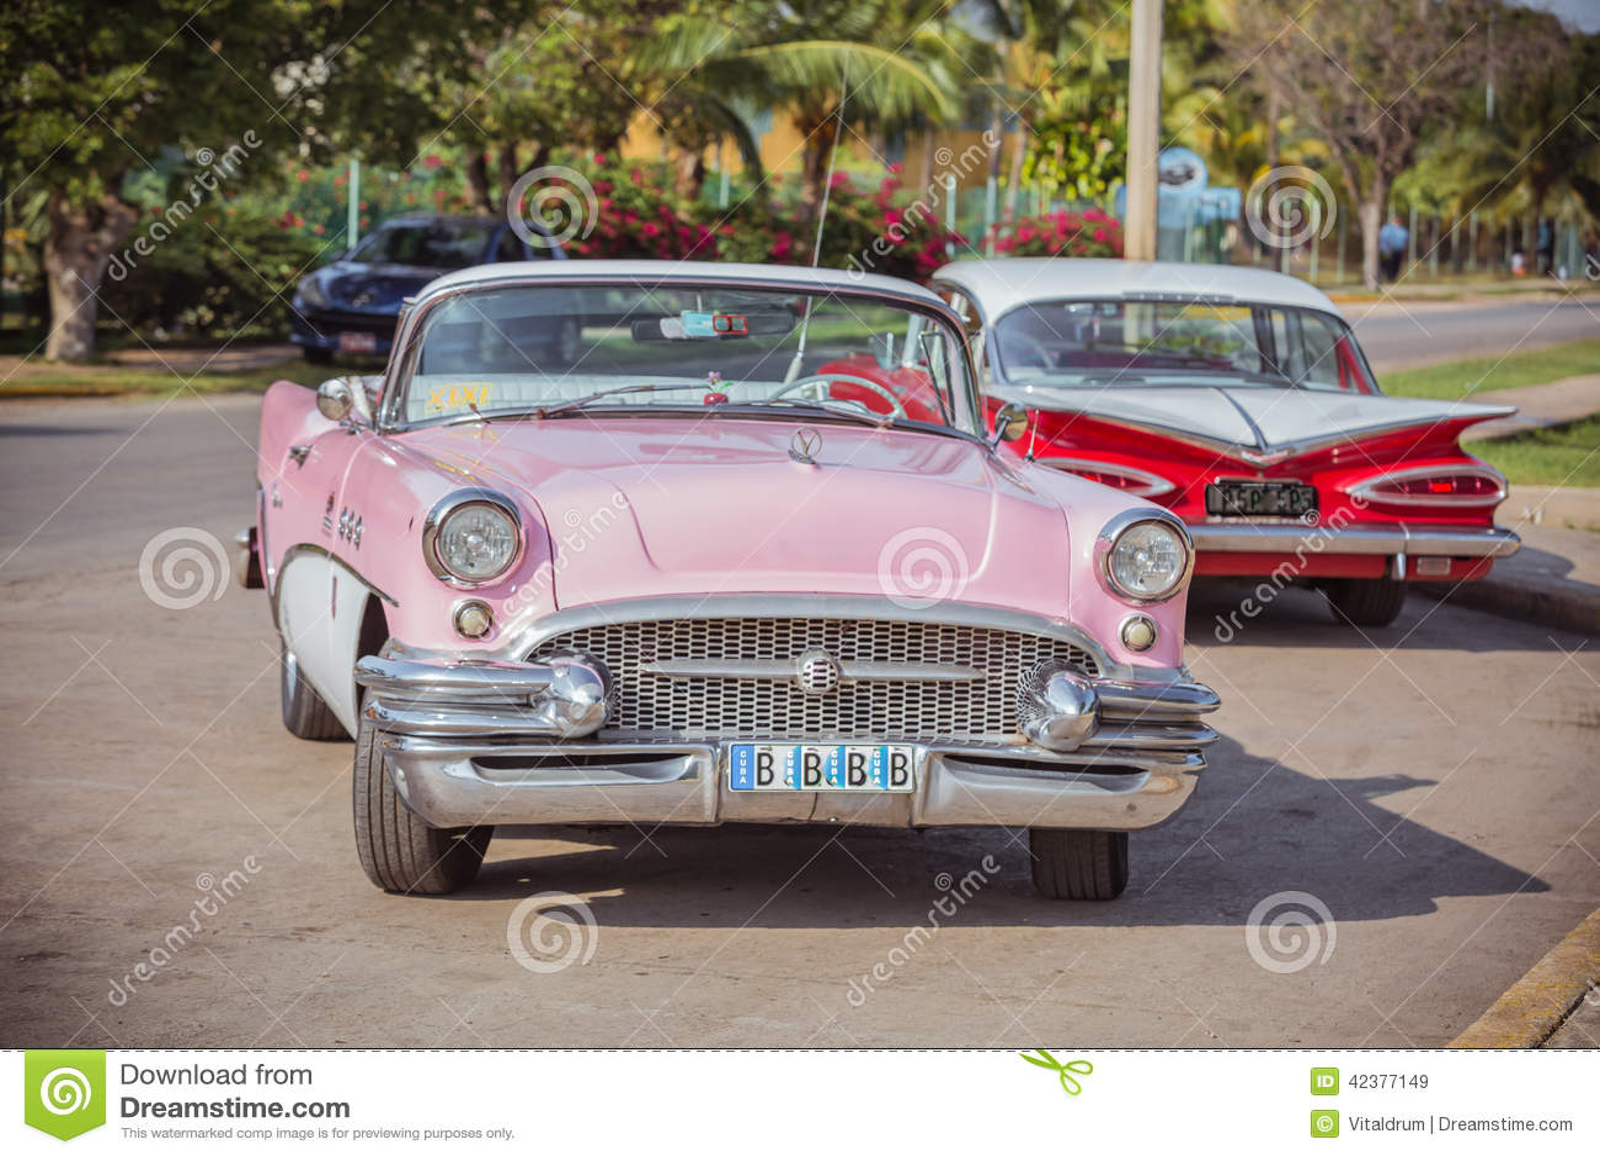 Classic cars stock photos | classic car wallpaper hd,for boys ...